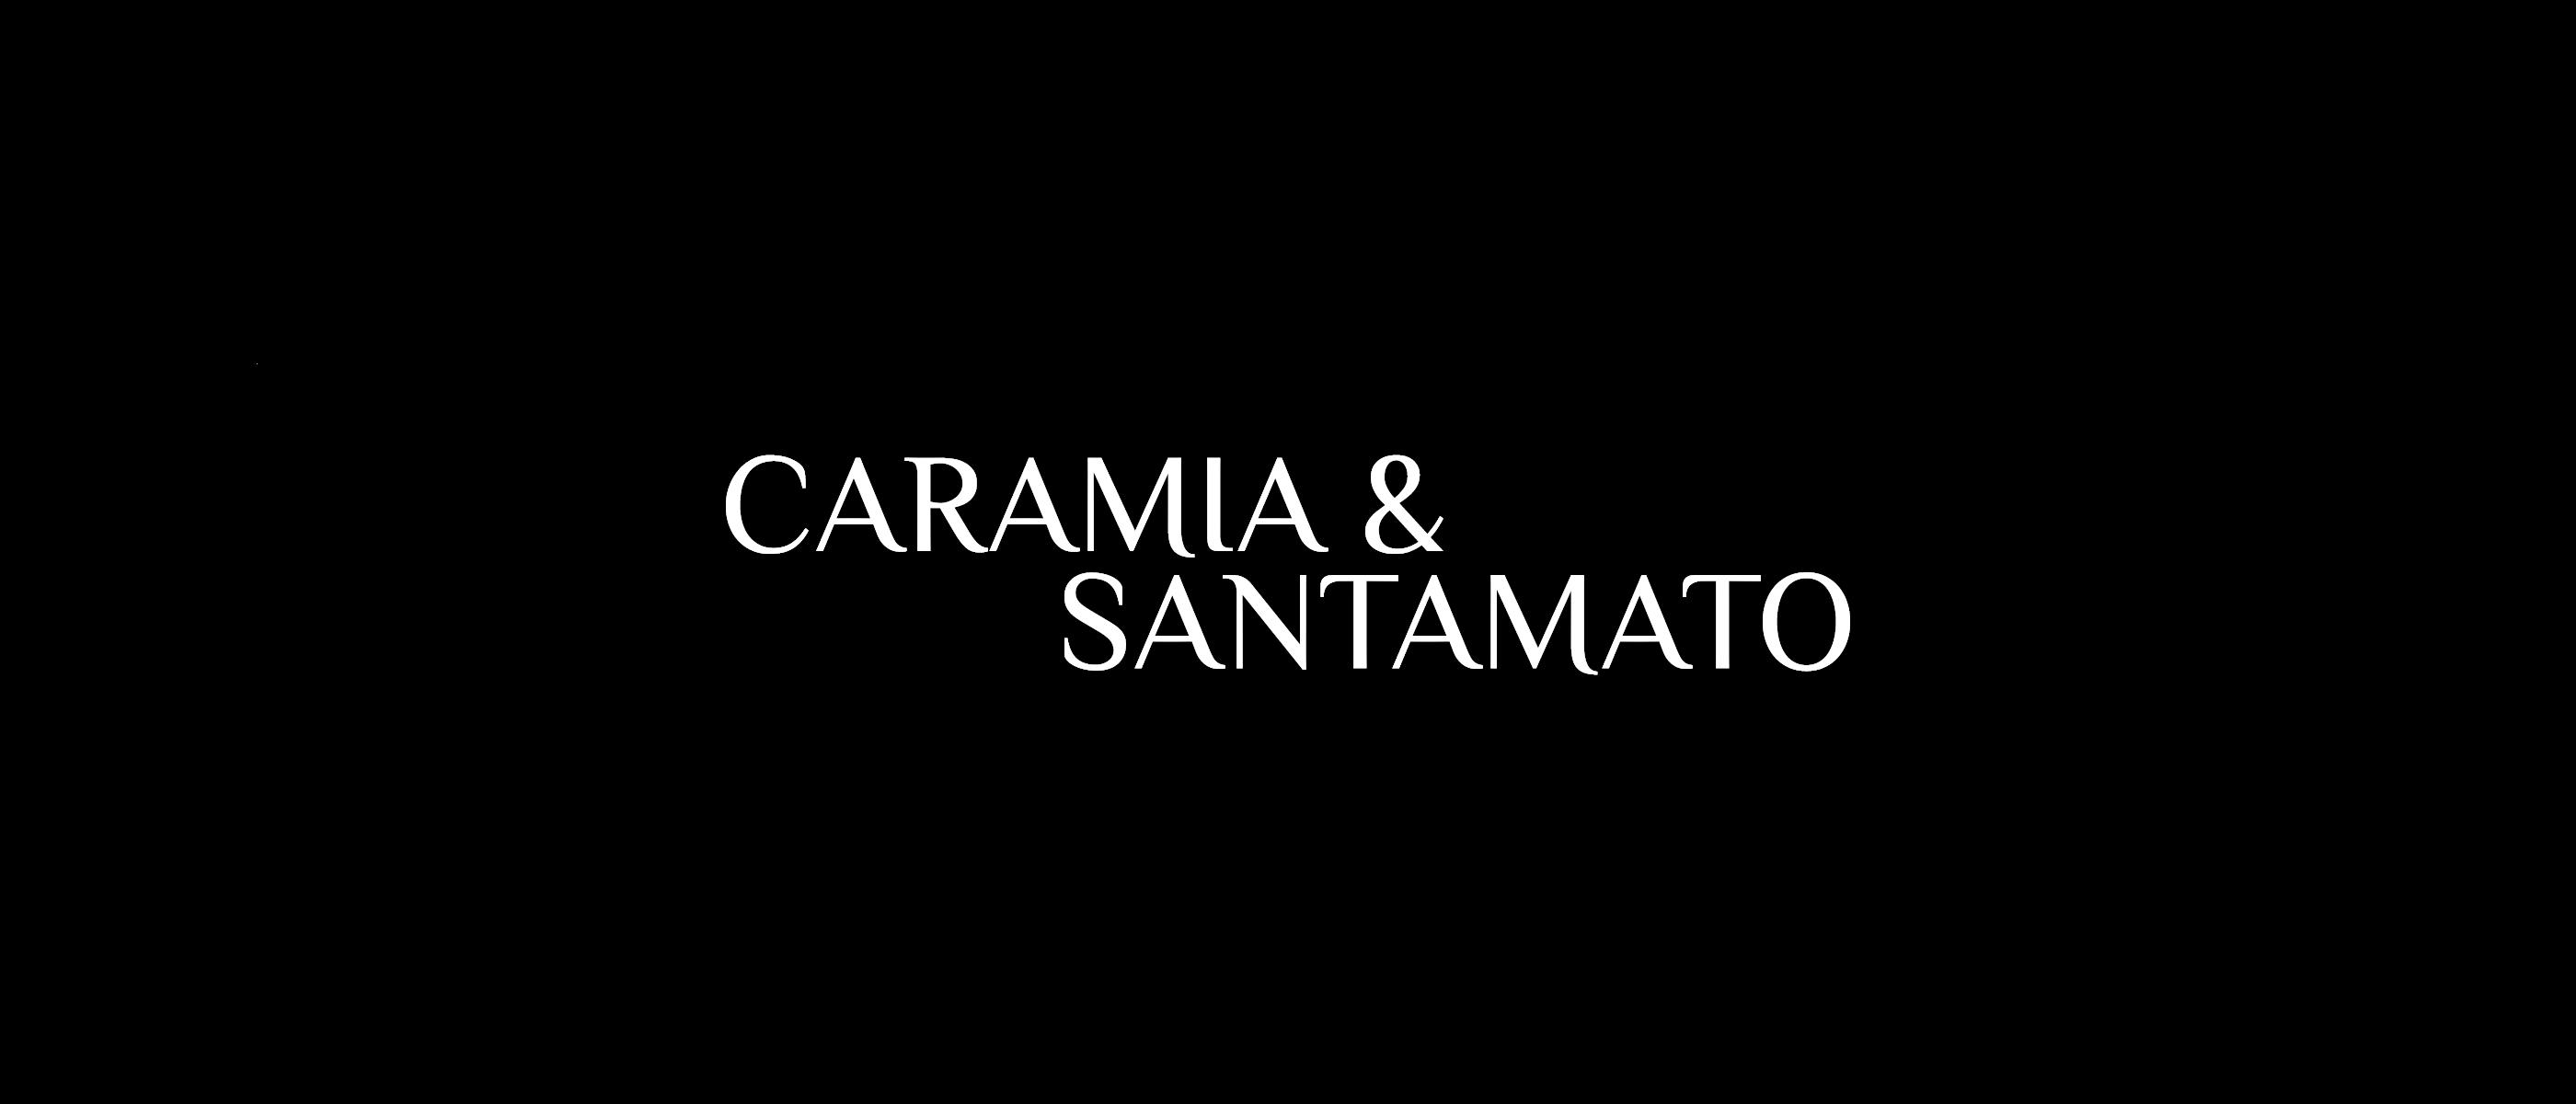 Studio legale Caramia Santamato